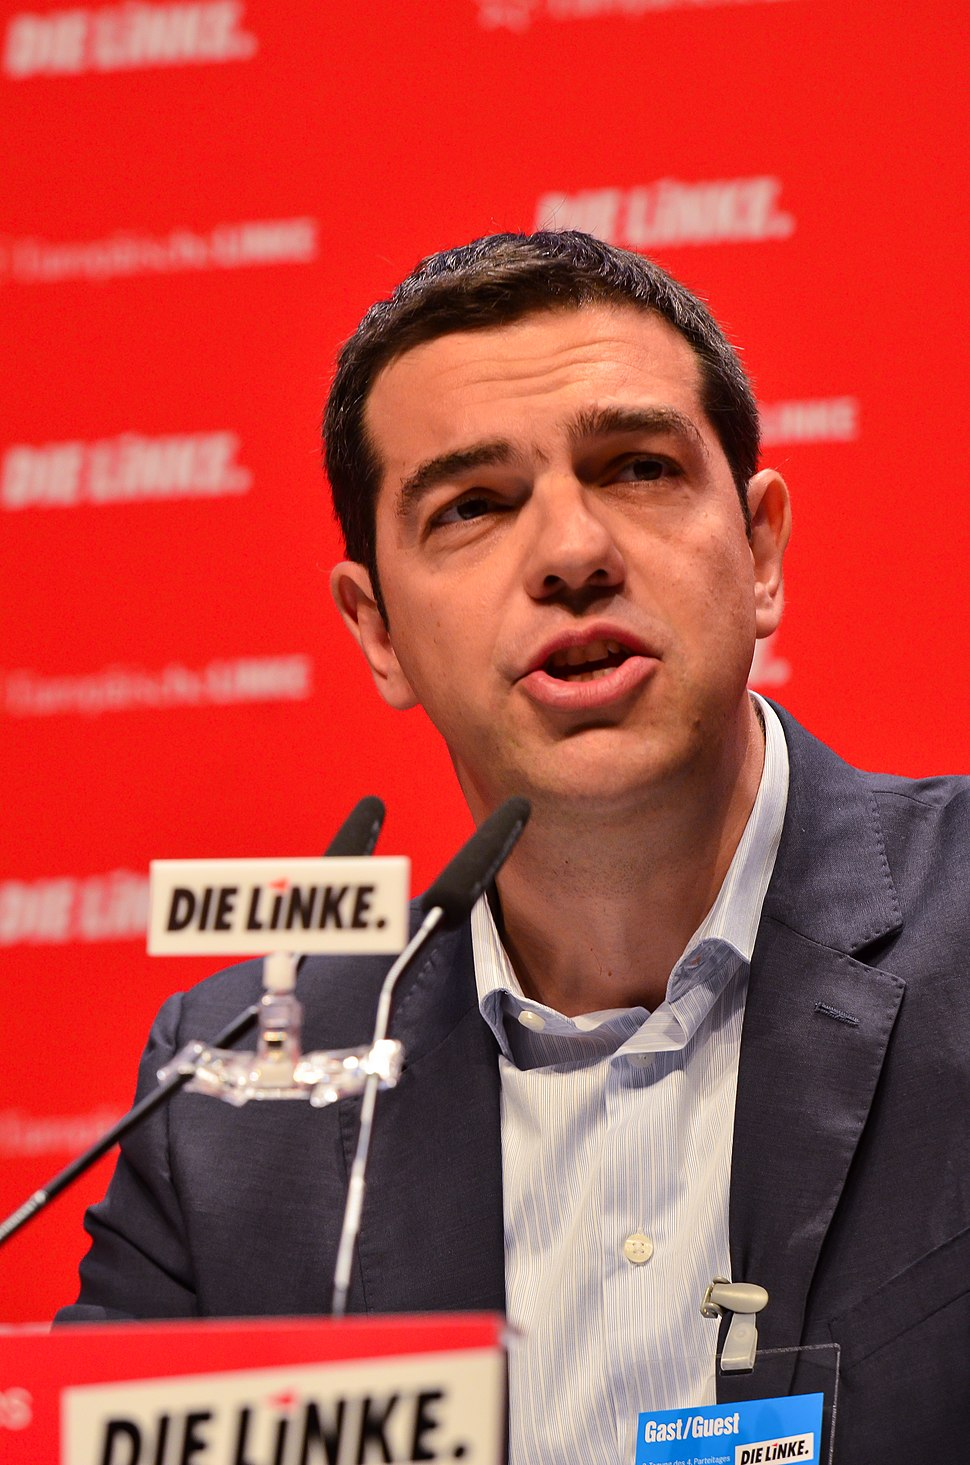 DIE LINKE Bundesparteitag 10. Mai 2014 Alexis Tsipras -7